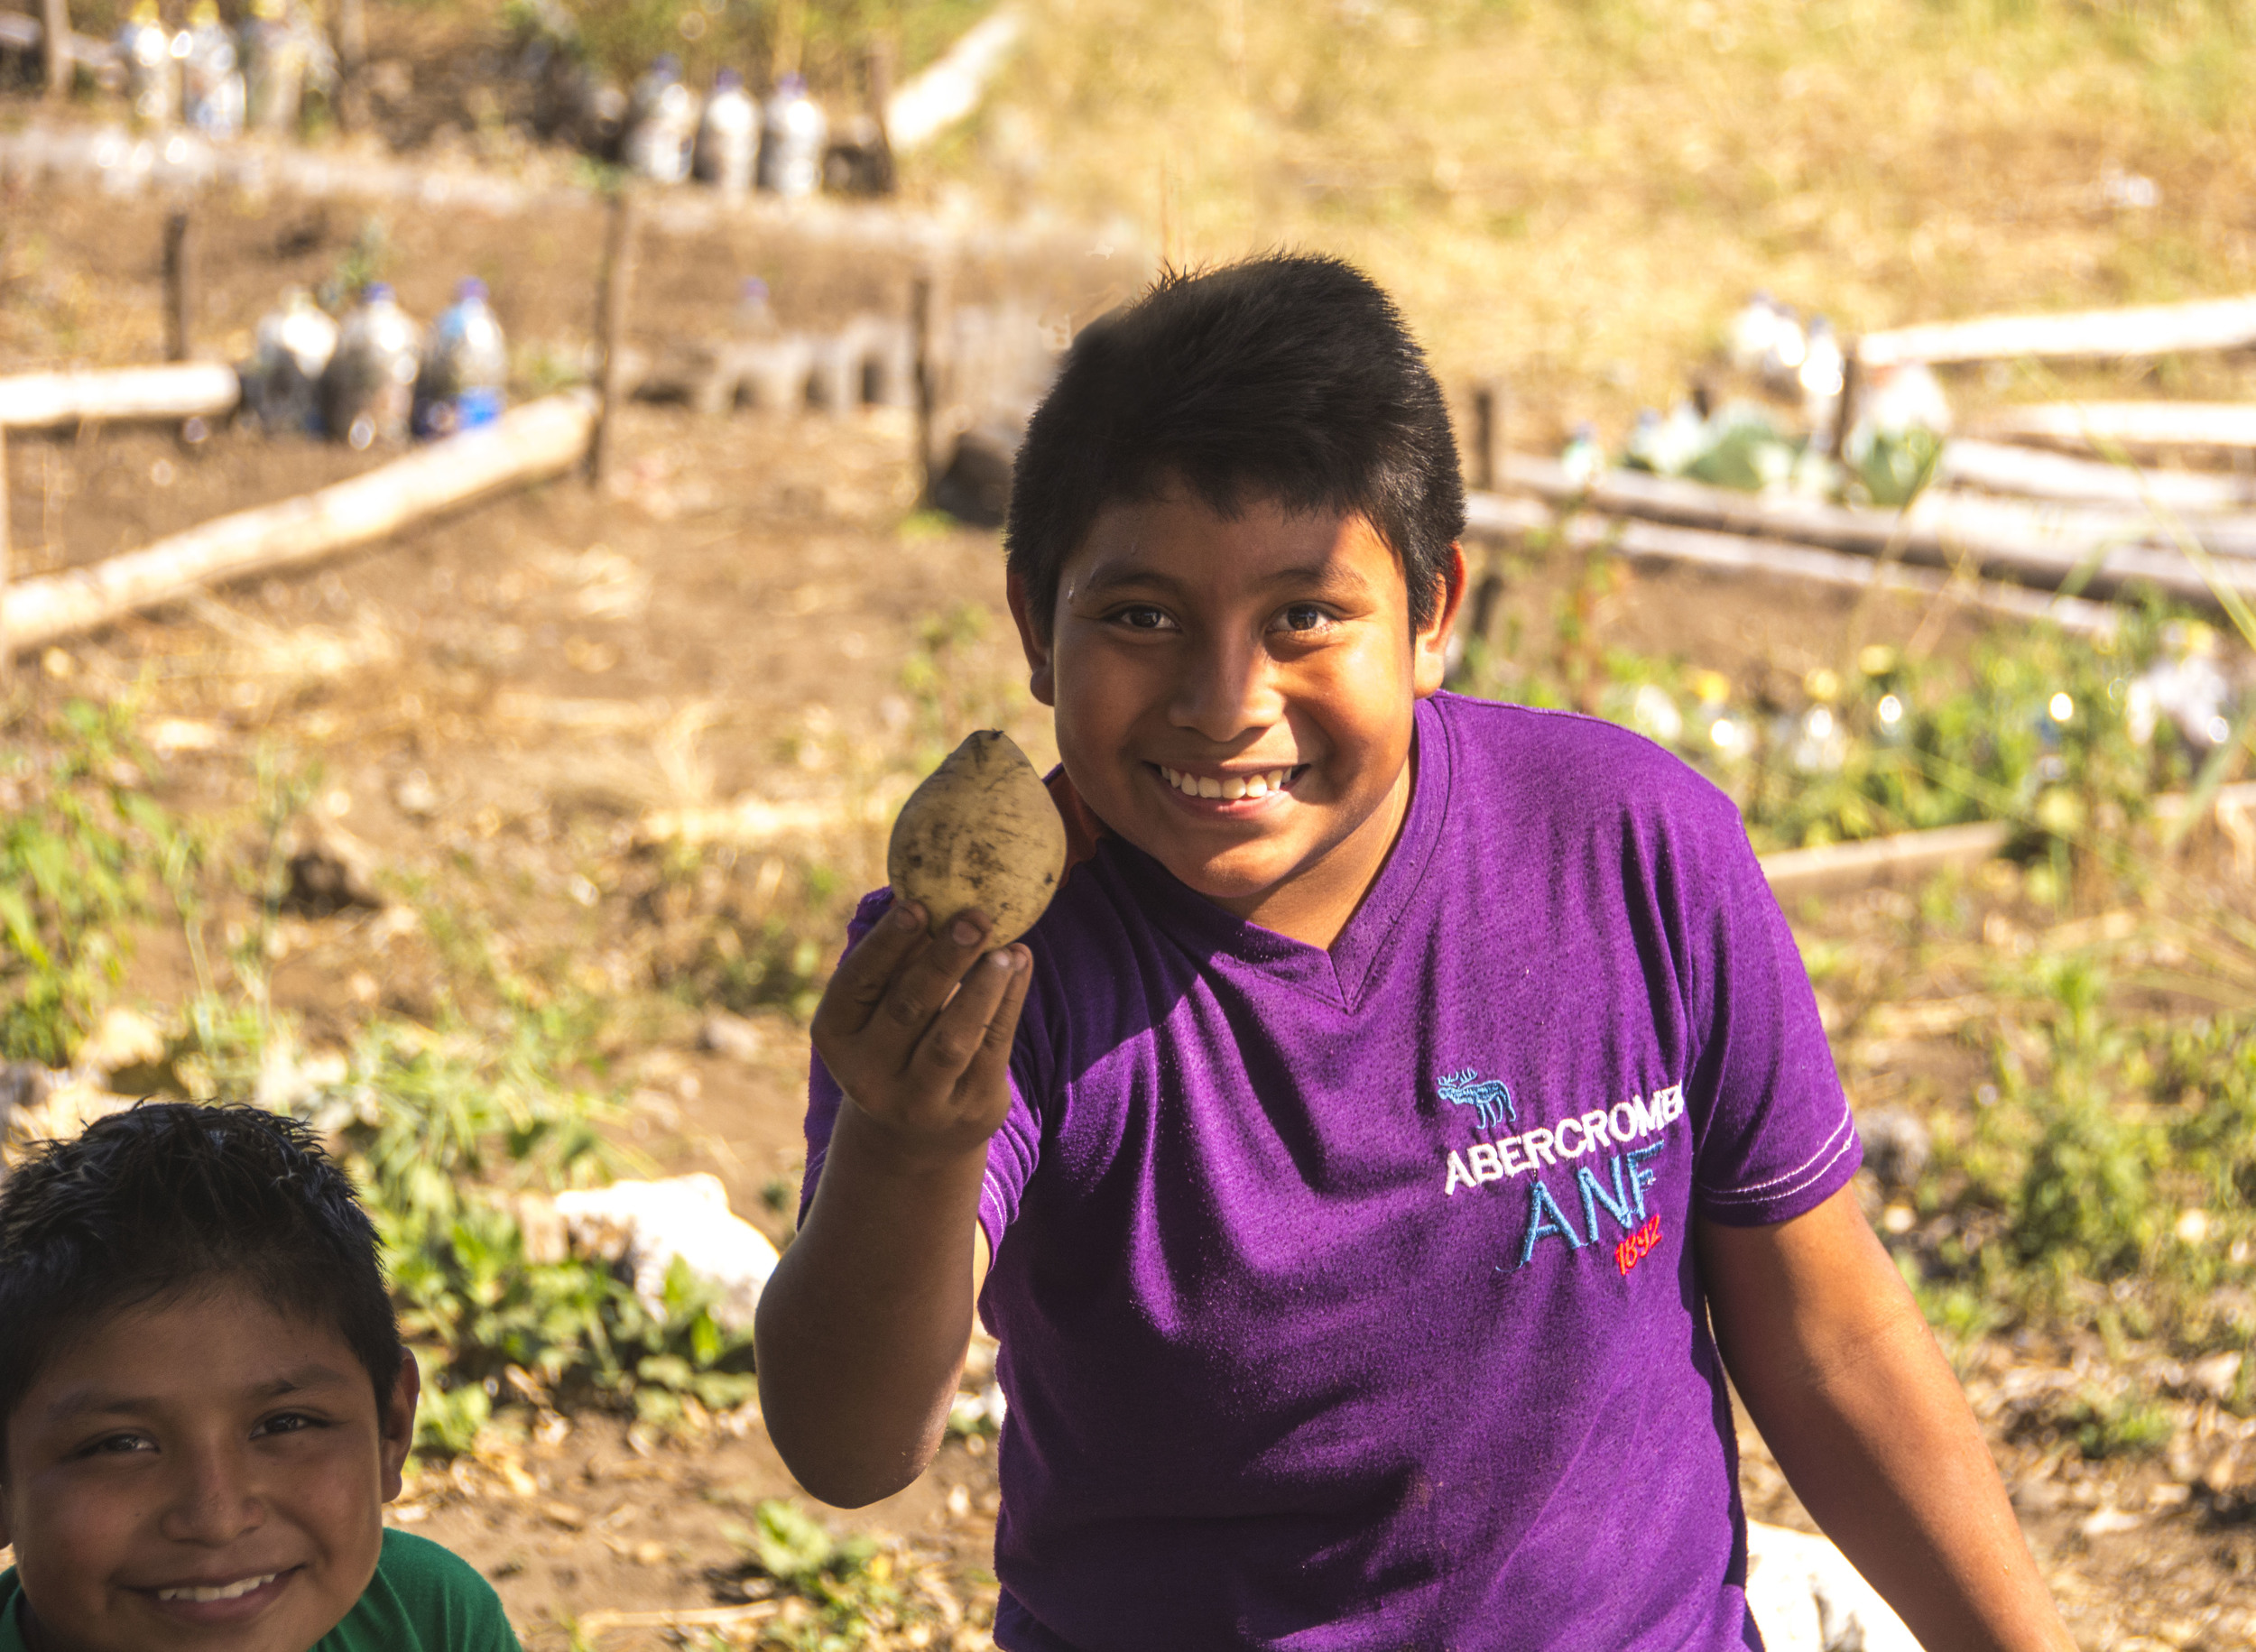 Student with Sweet Potato. In the garden at Nueva Vida School, San Lucas Toliman, Guatemala.